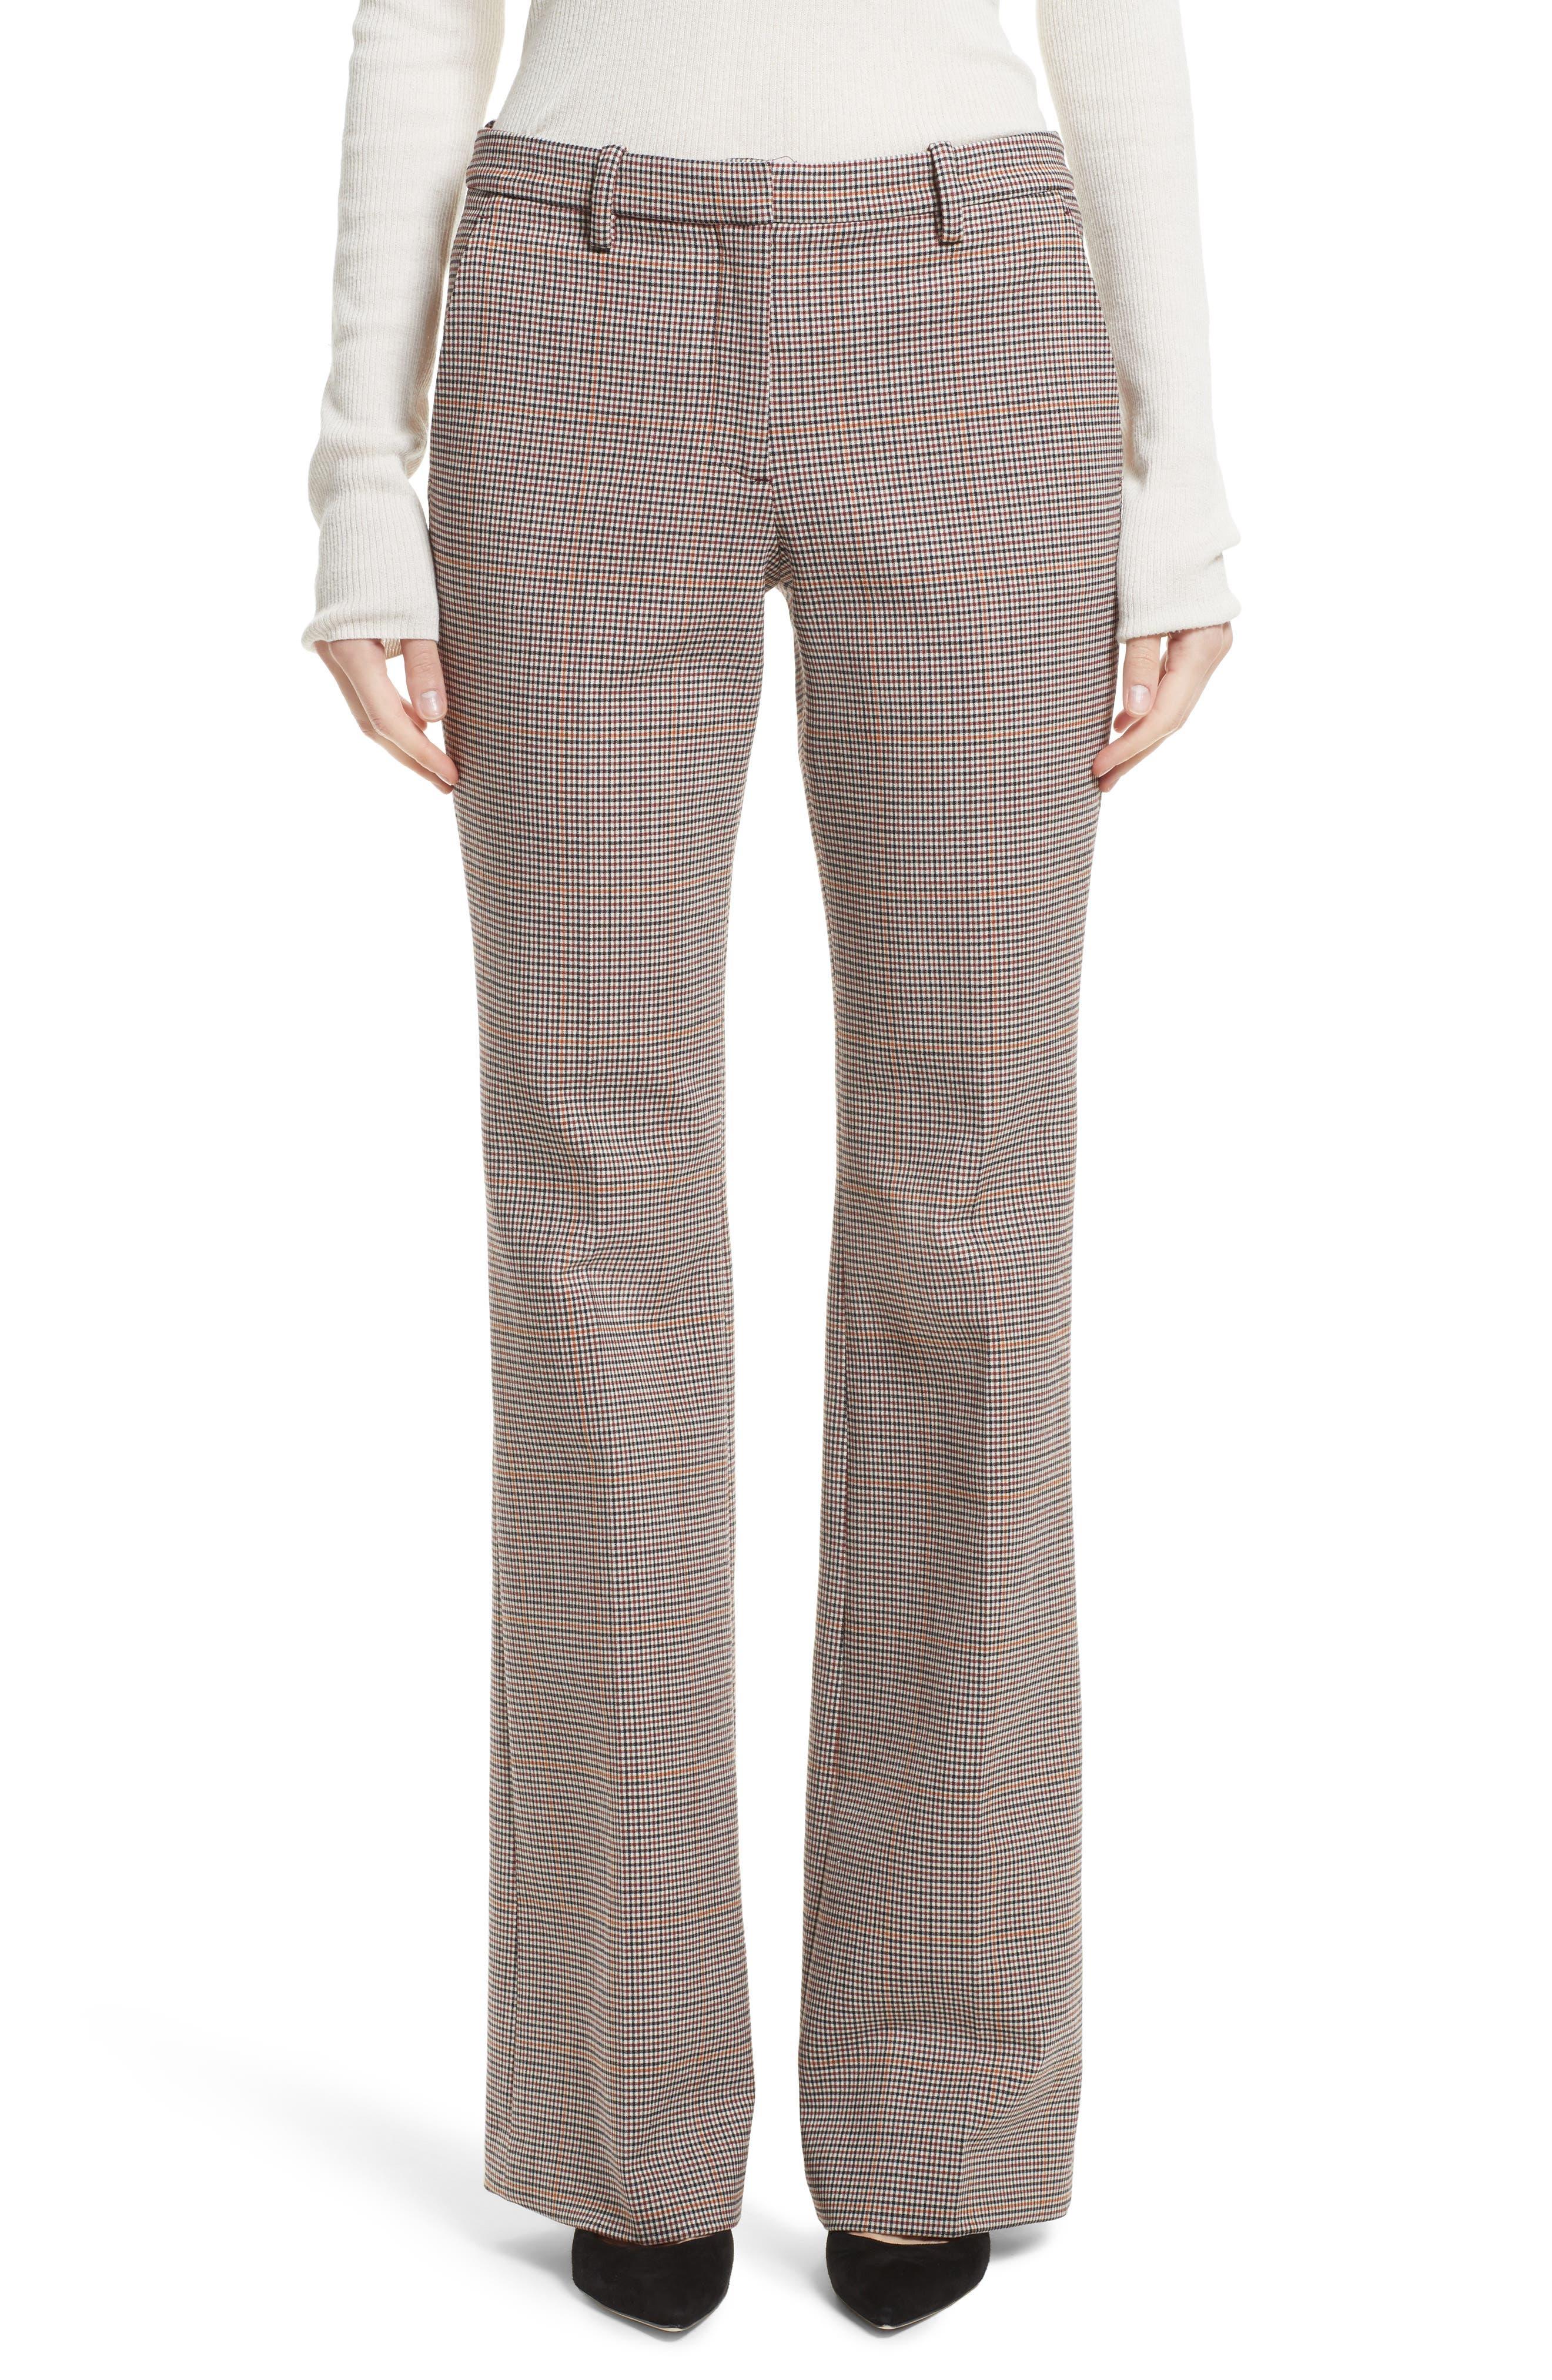 Main Image - Theory Demitria 2 Flare Leg Stretch Wool Pants